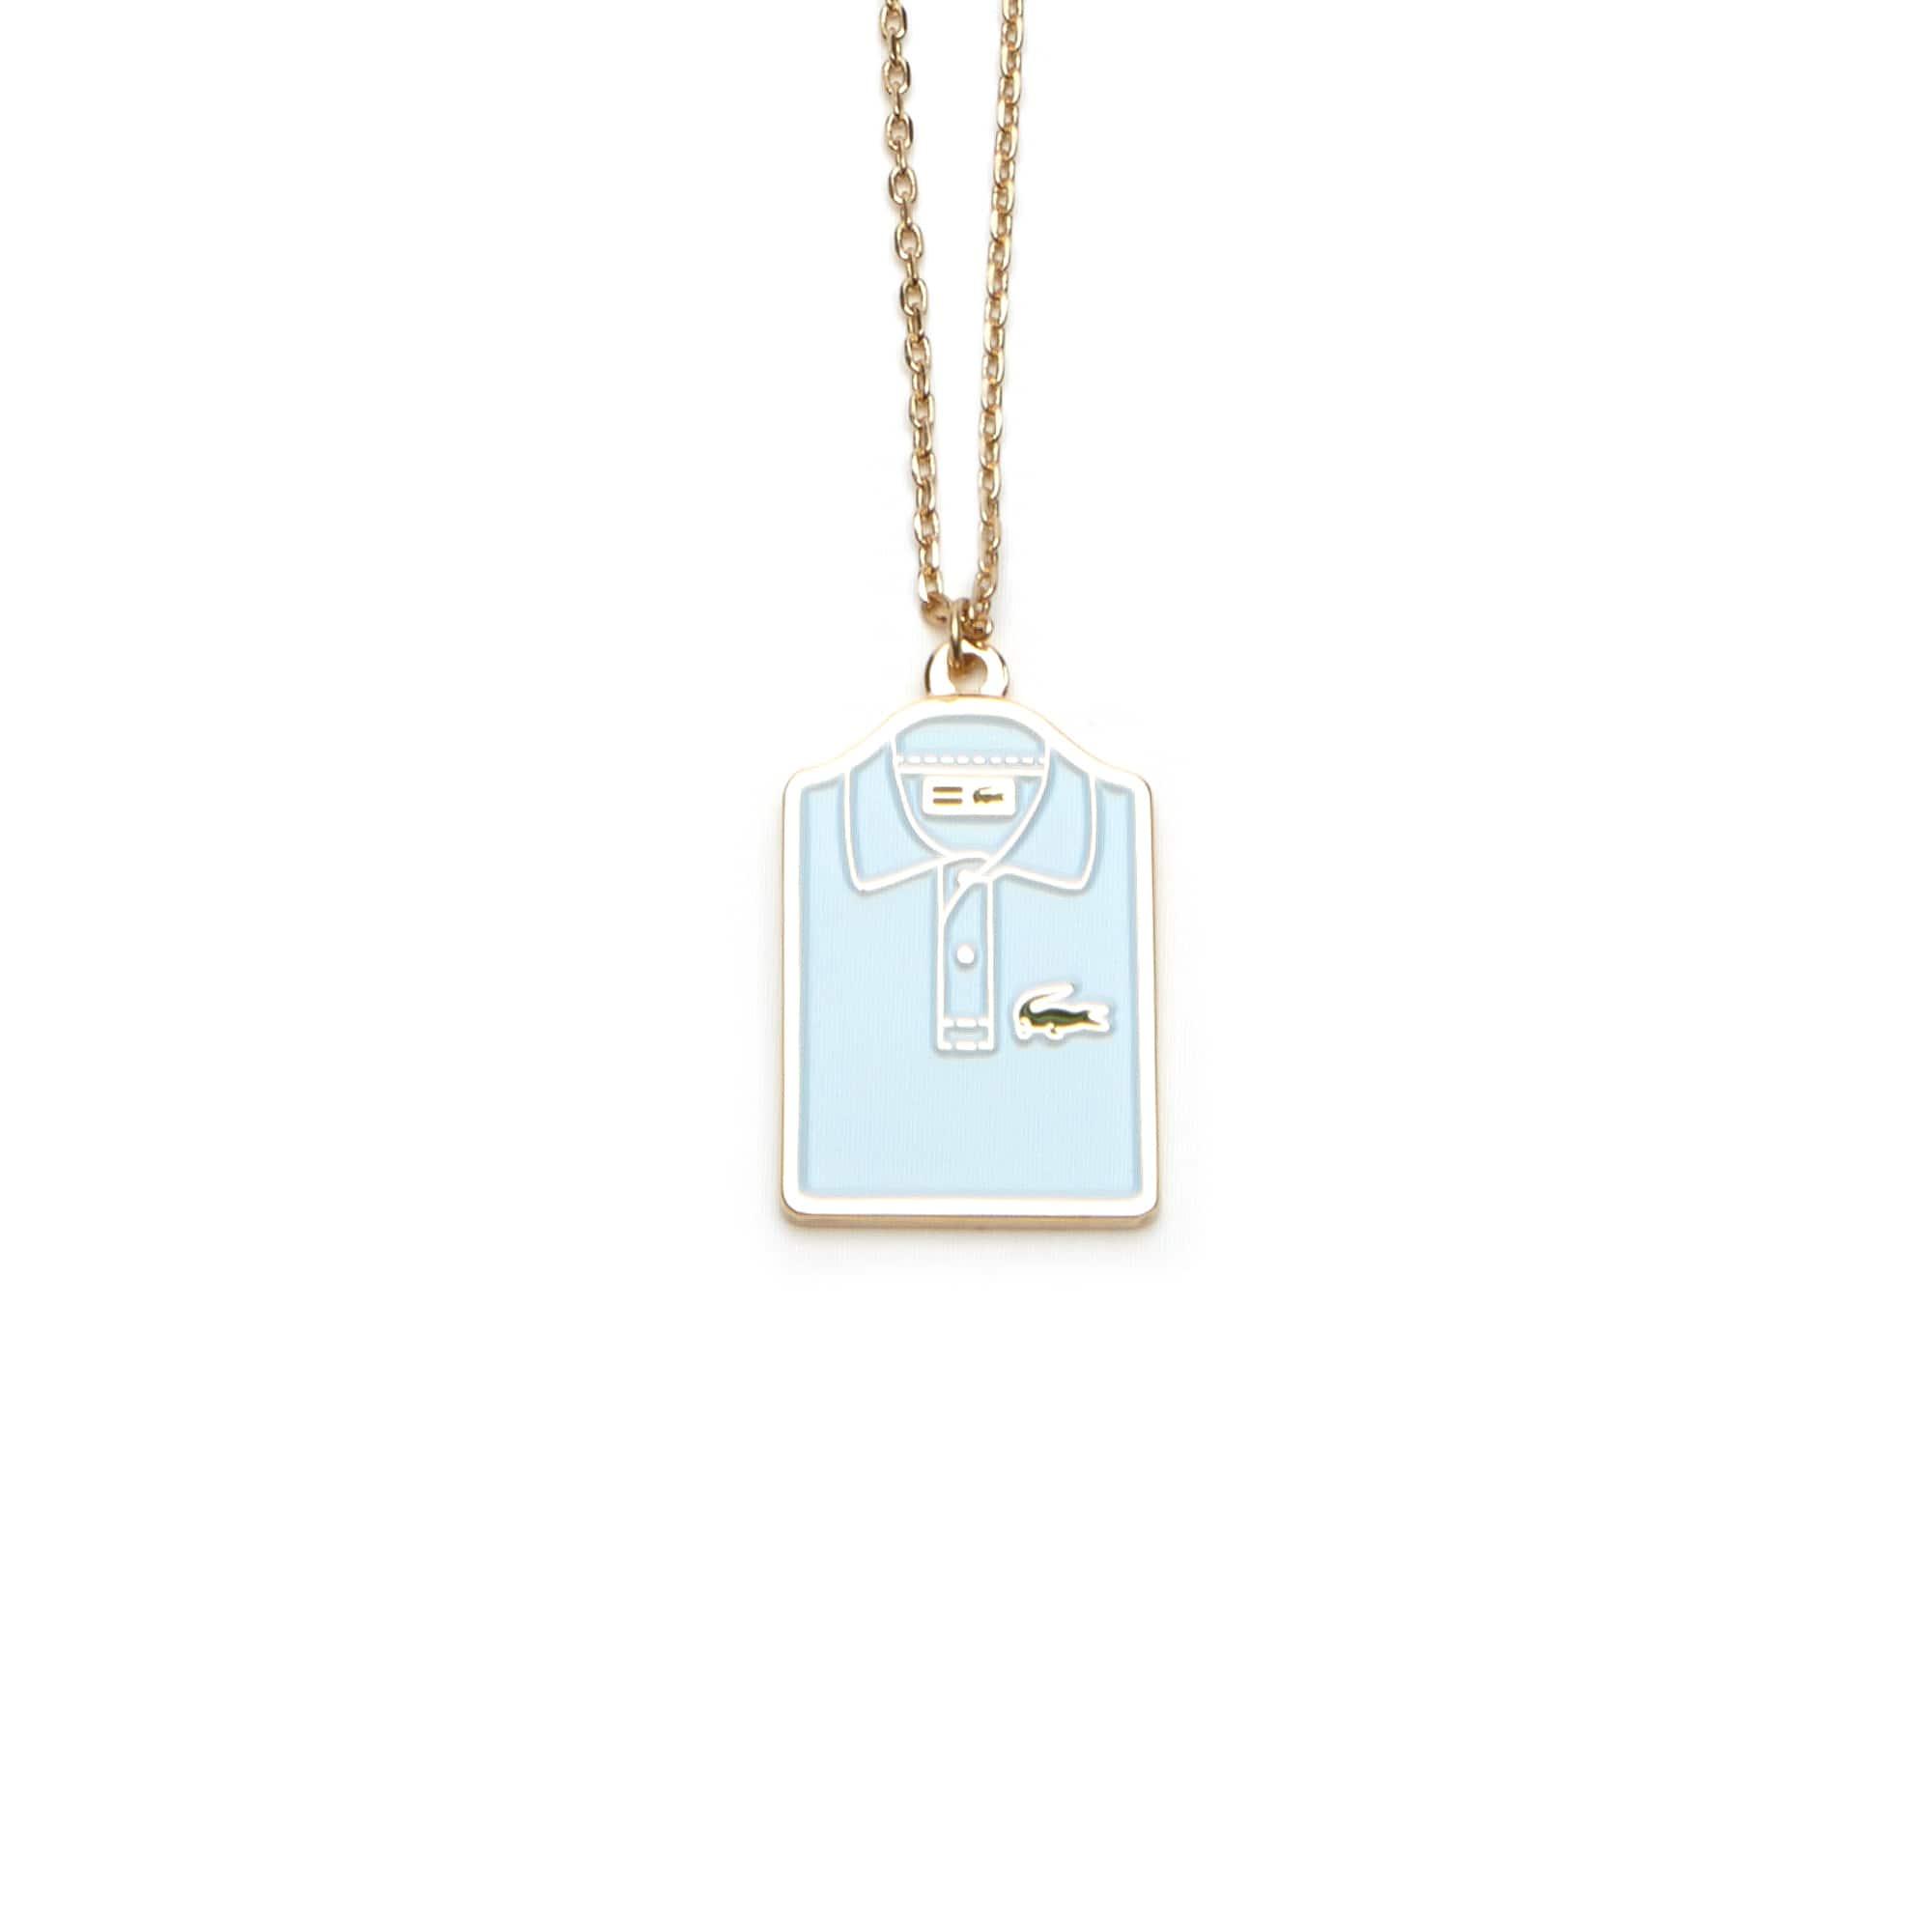 Lacoste Polo Fashion Show Necklace